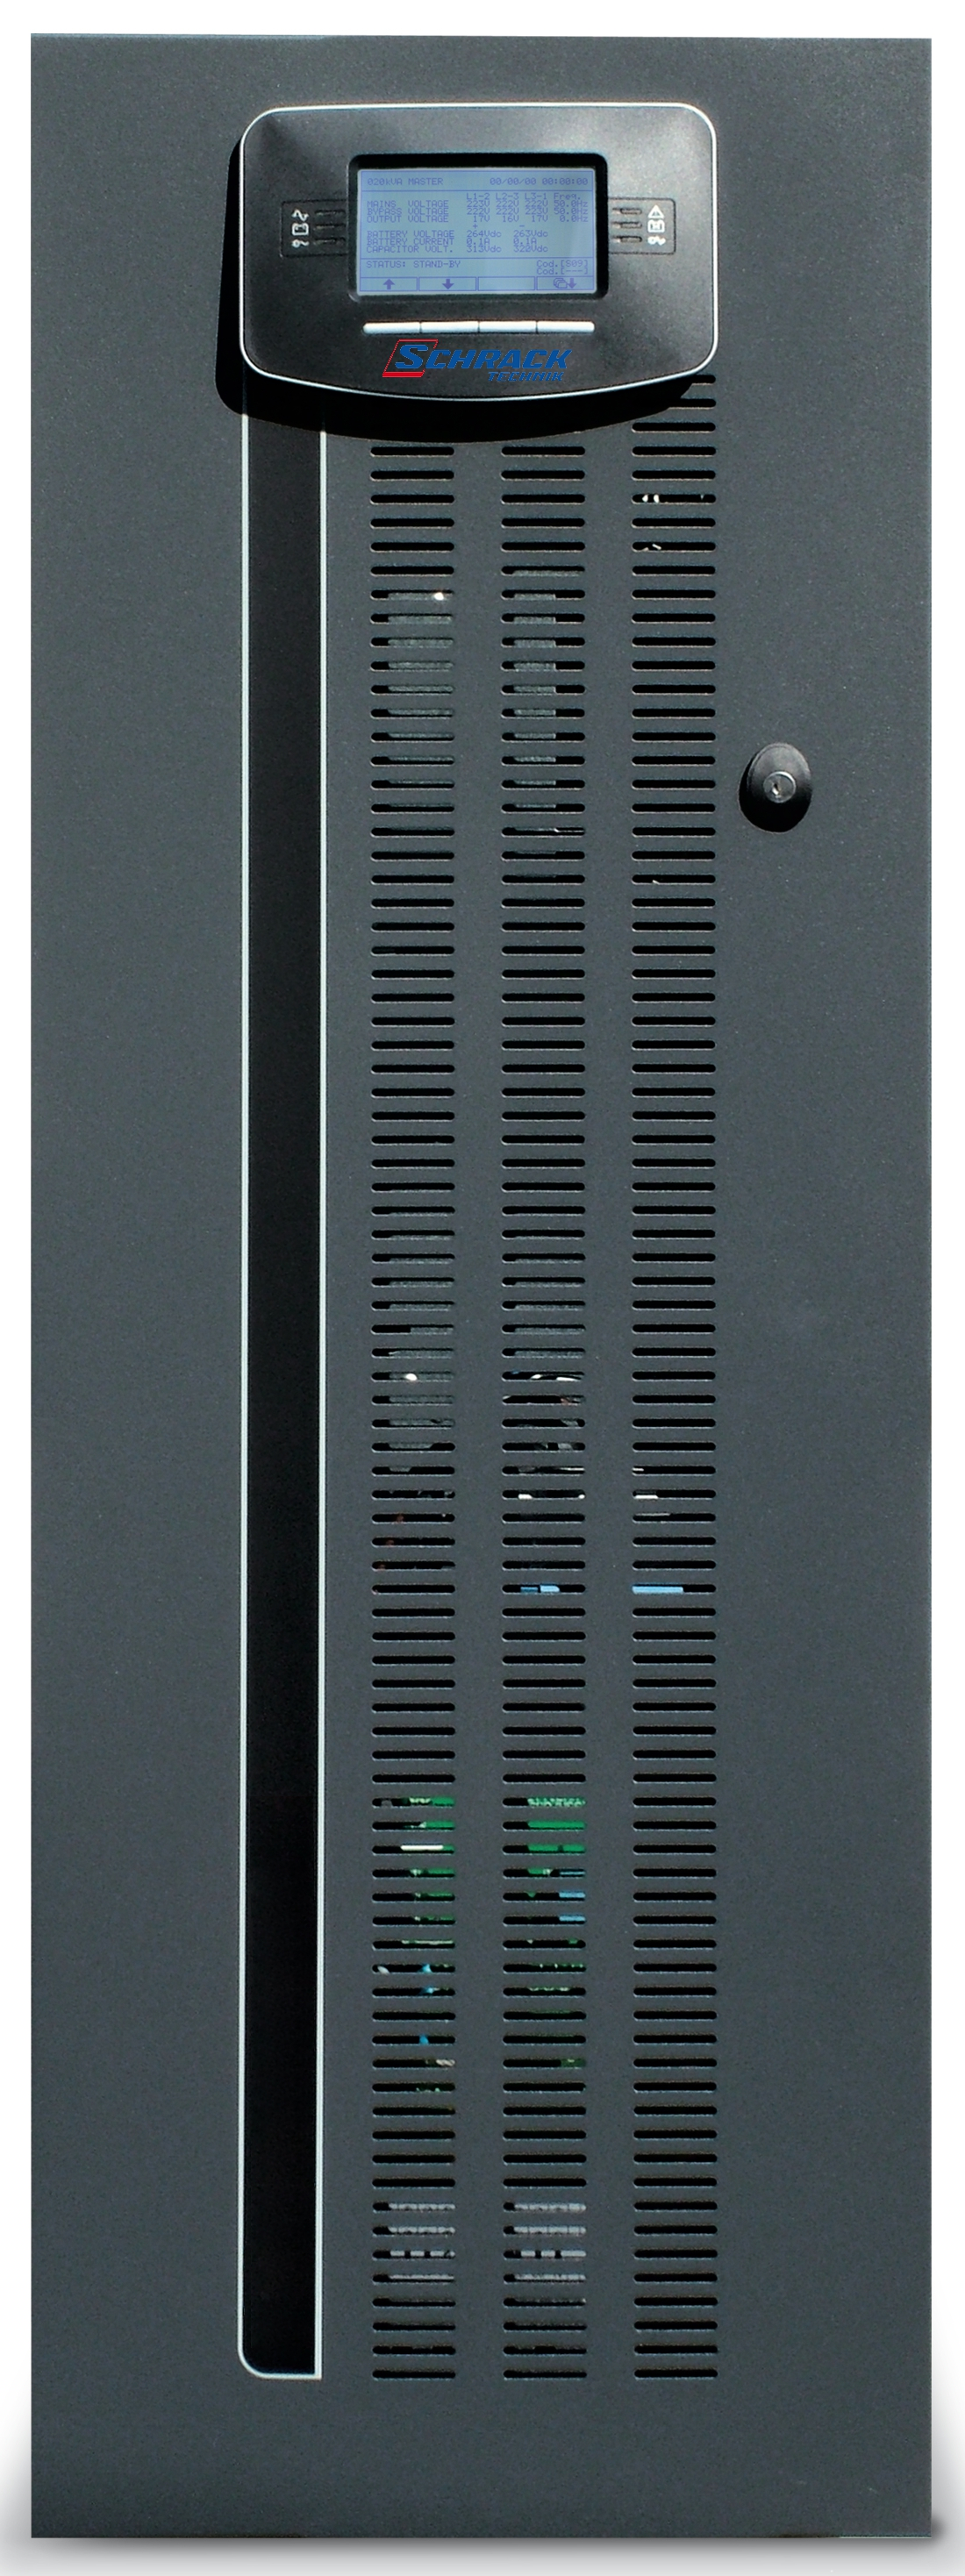 1 Stk USV AVARA Multi 12kVA 10,8kW 12Min.3ph/3ph /Online USMLT12XA5